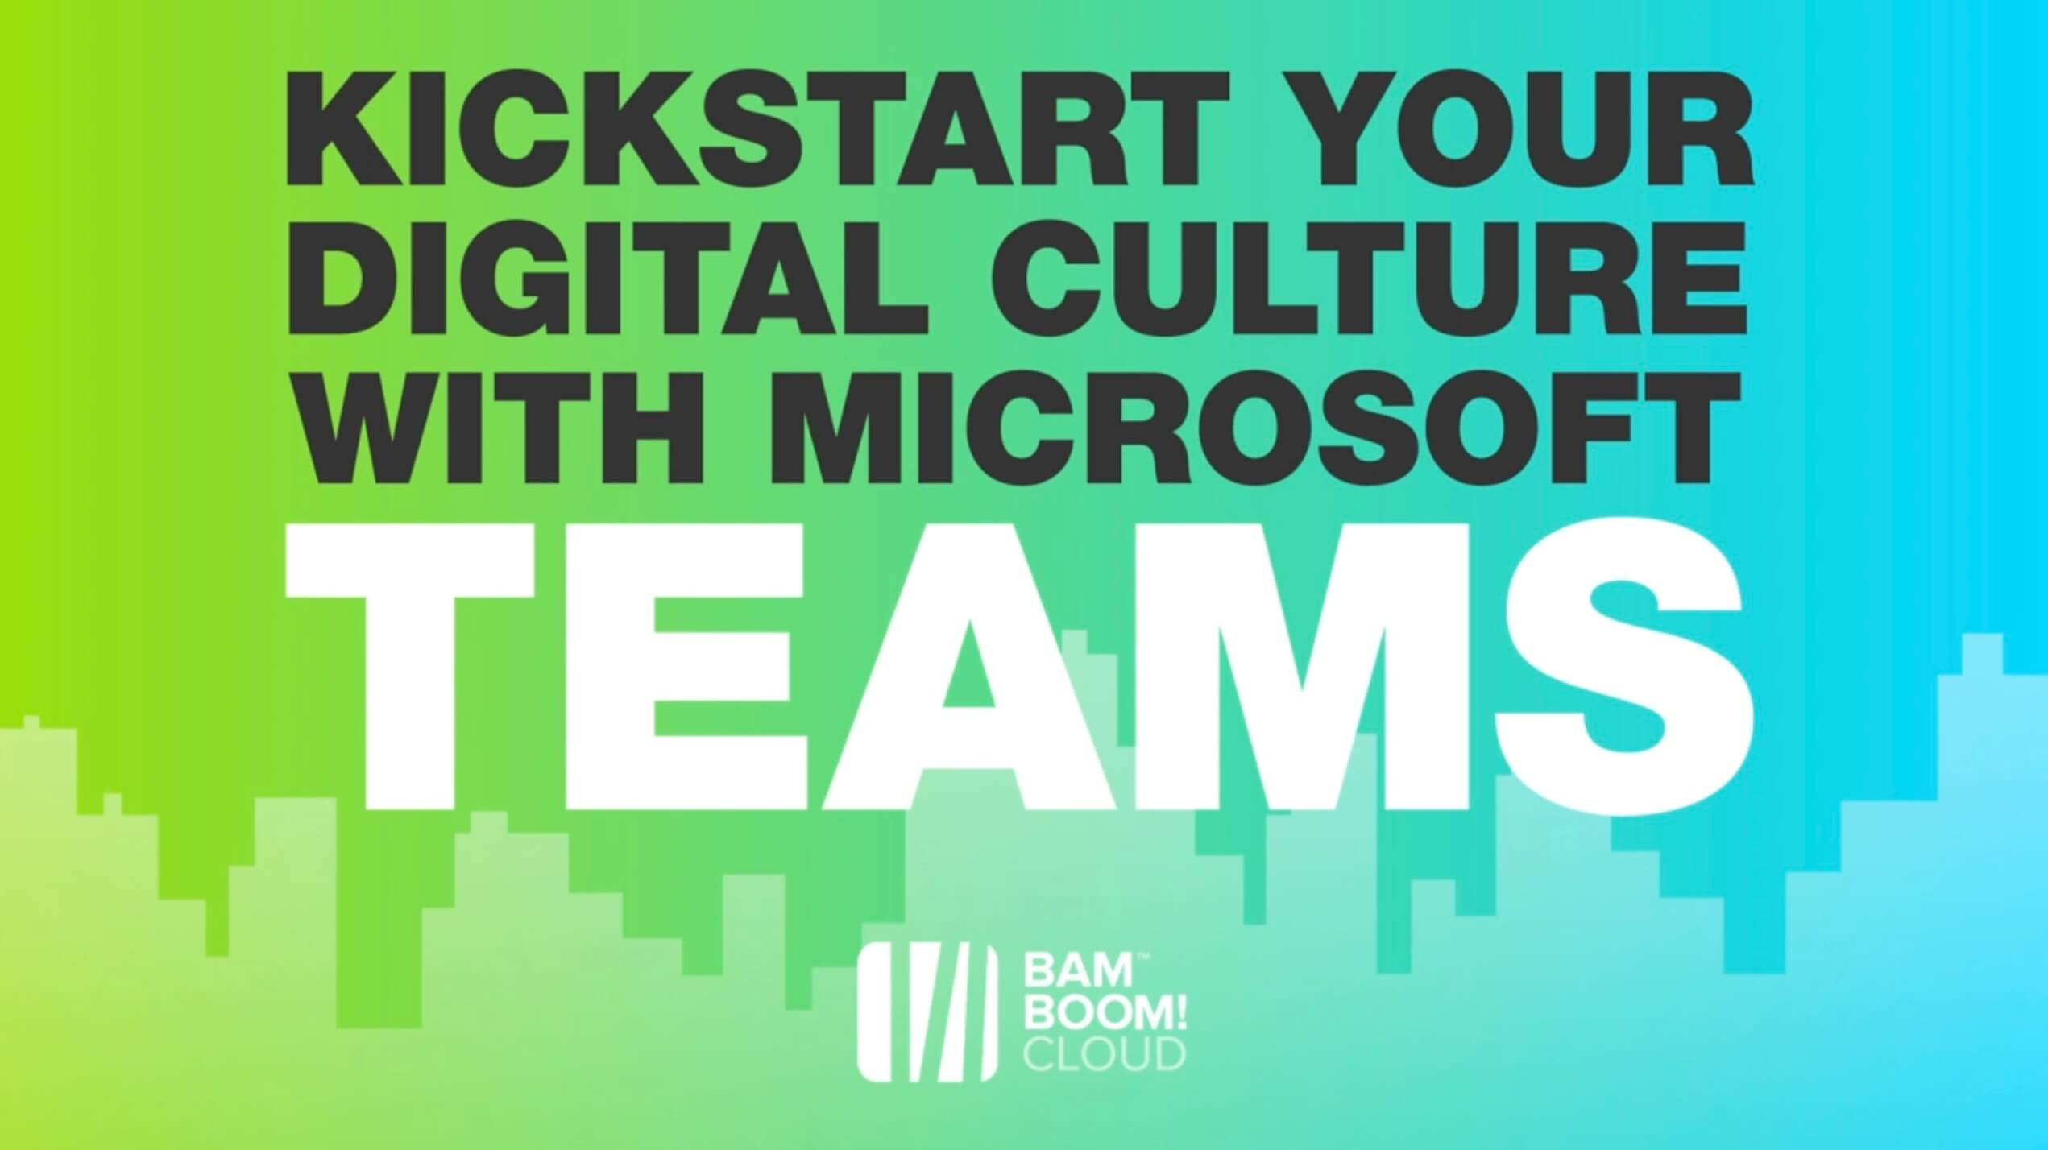 KickStart your Digital Culture with Bam Boom Cloud and Microsoft Teams